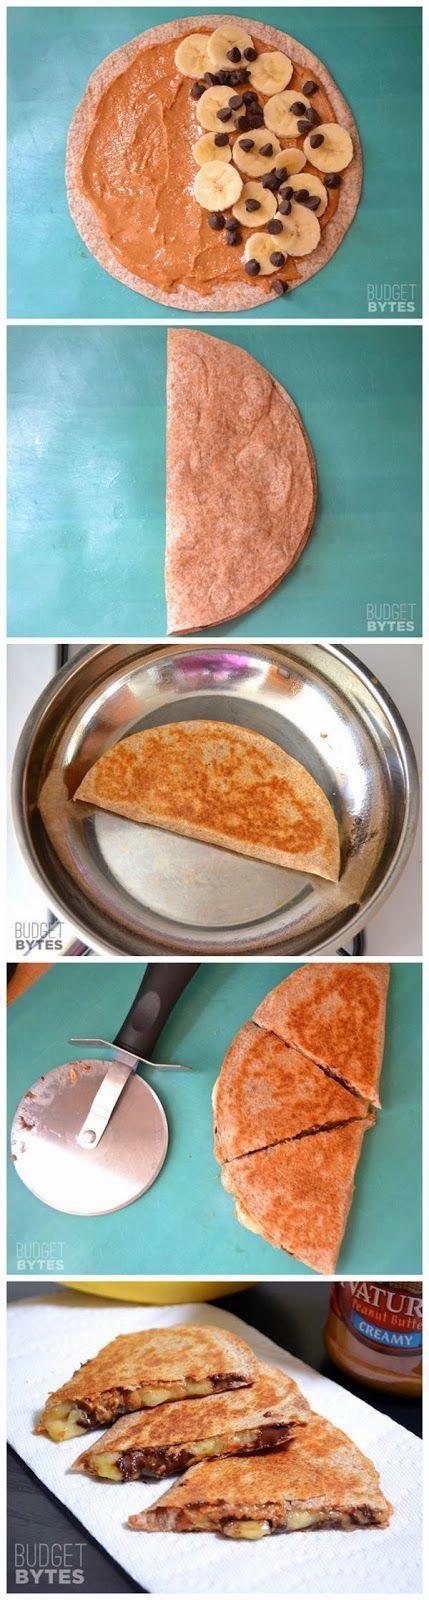 Peanut Butter Banana Quesadillas. New Breakfast Idea.